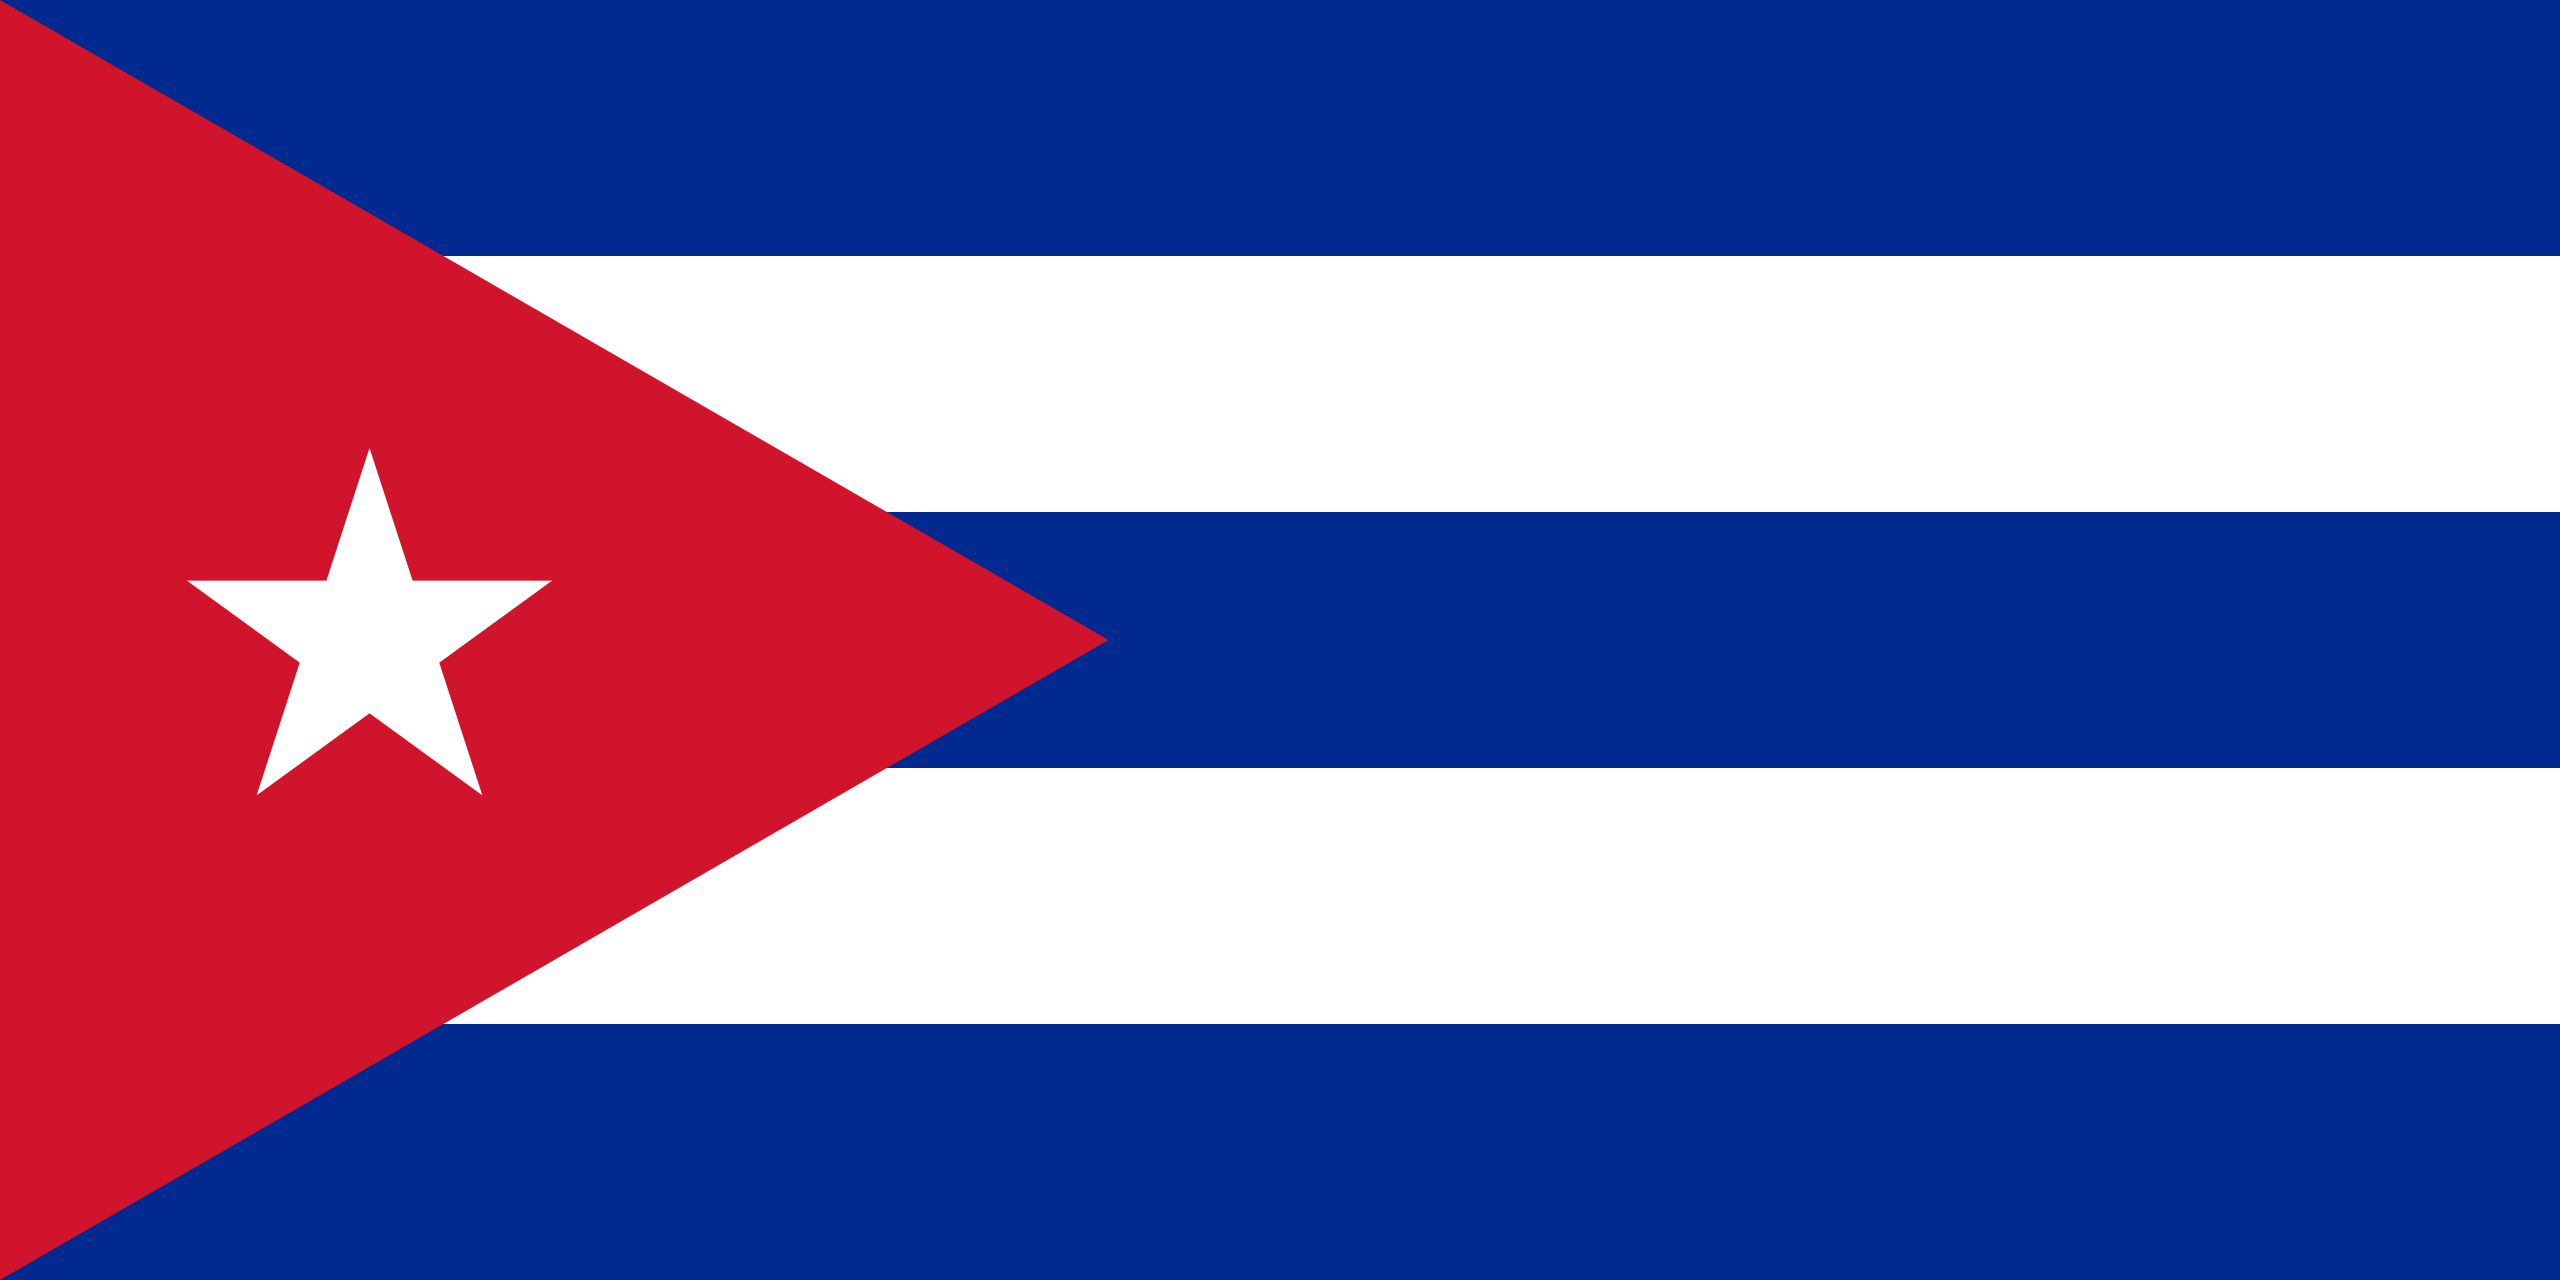 Flag Of Cuba HD wallpapers, Desktop wallpaper - most viewed